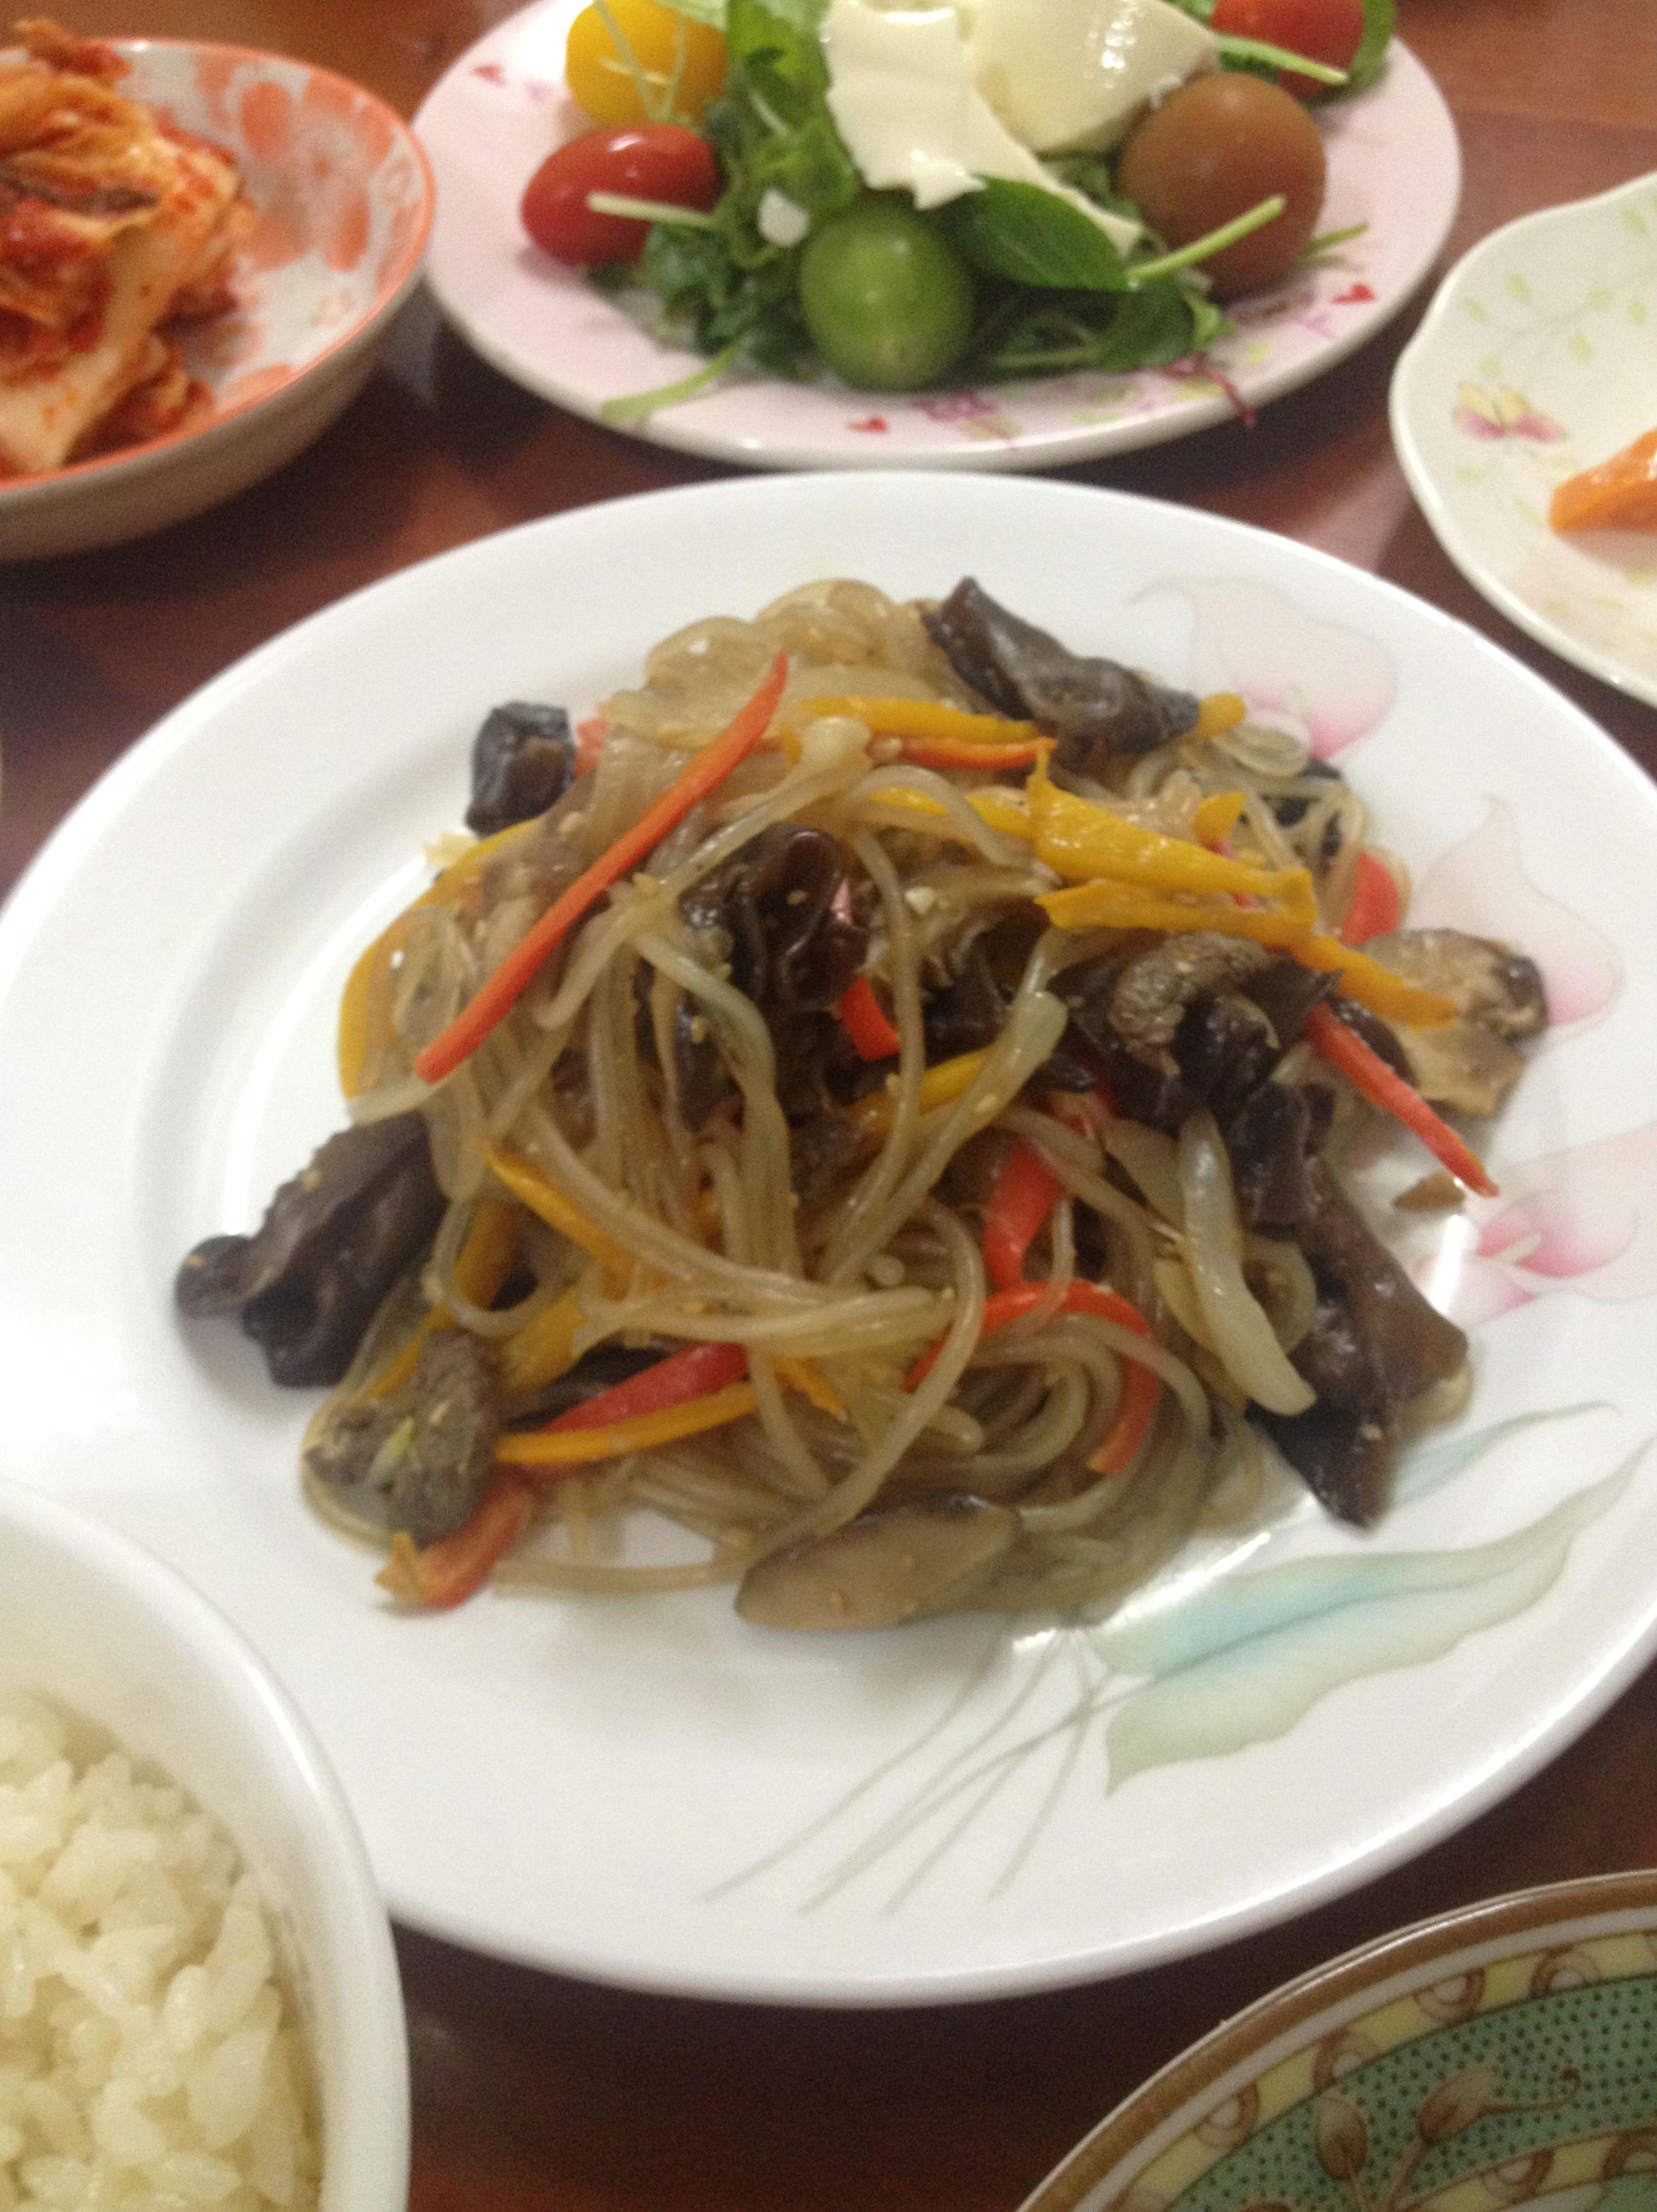 Restaurante de cocina típica coreana en Madrid